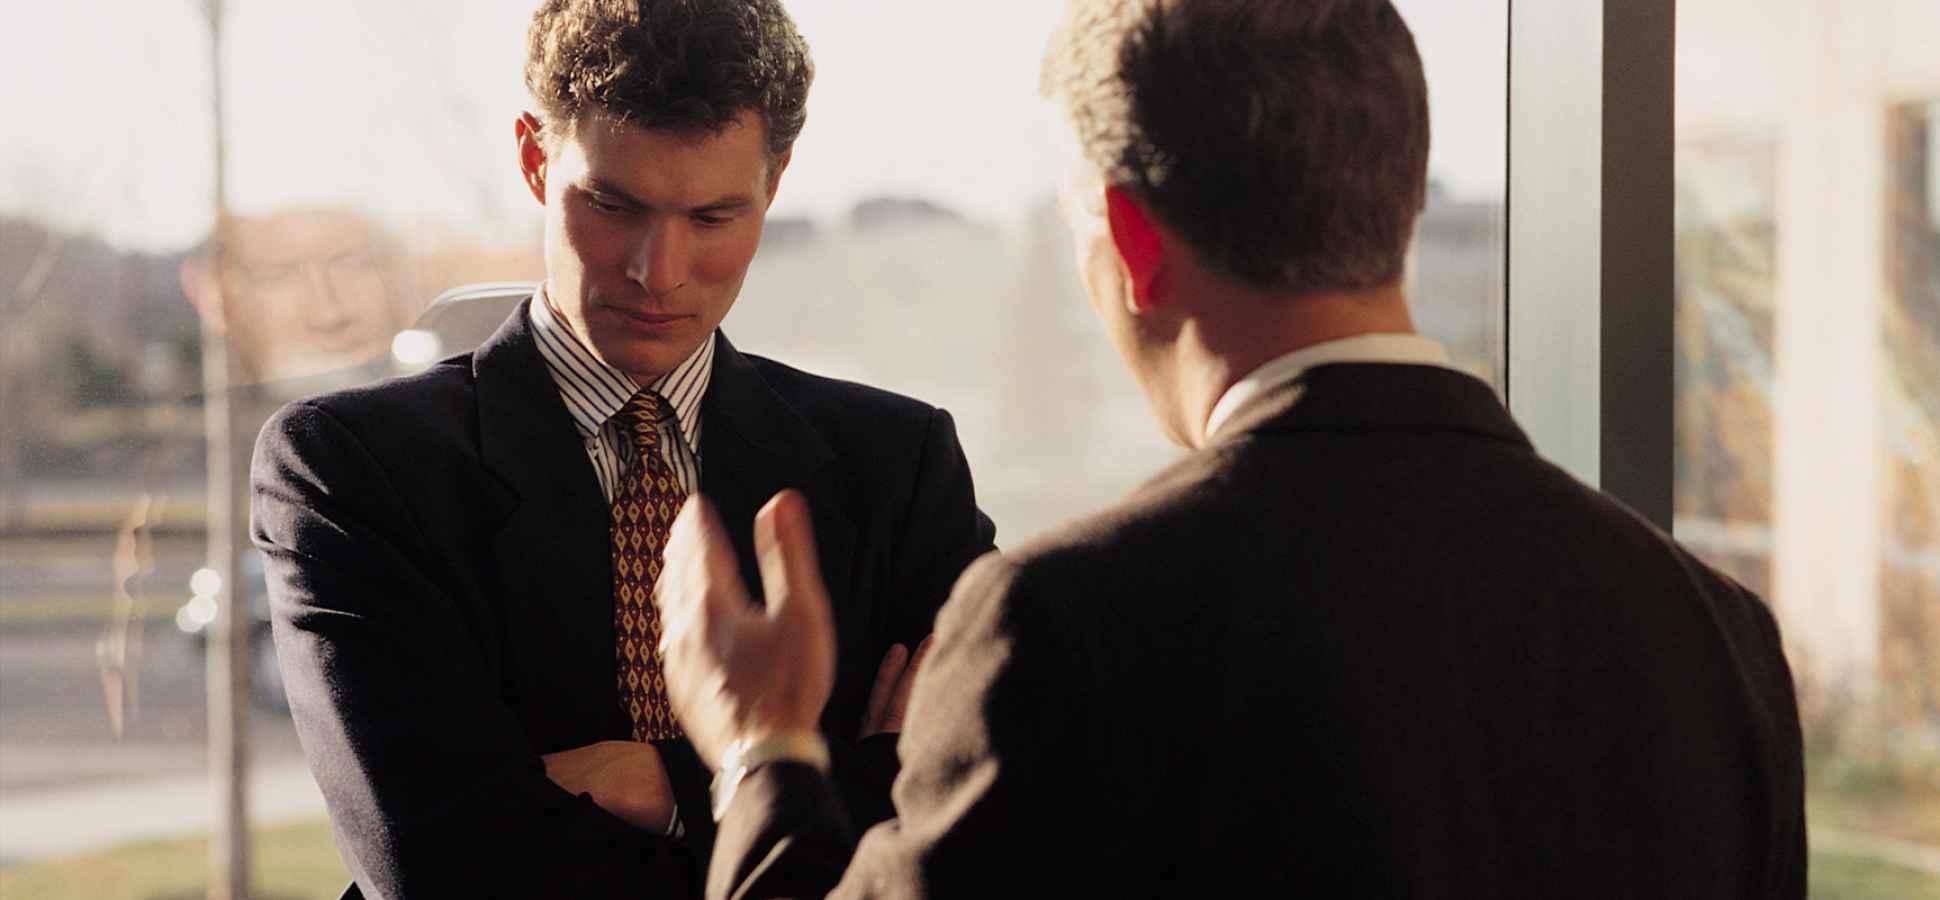 5 Steps to Managing Someone You Dislike